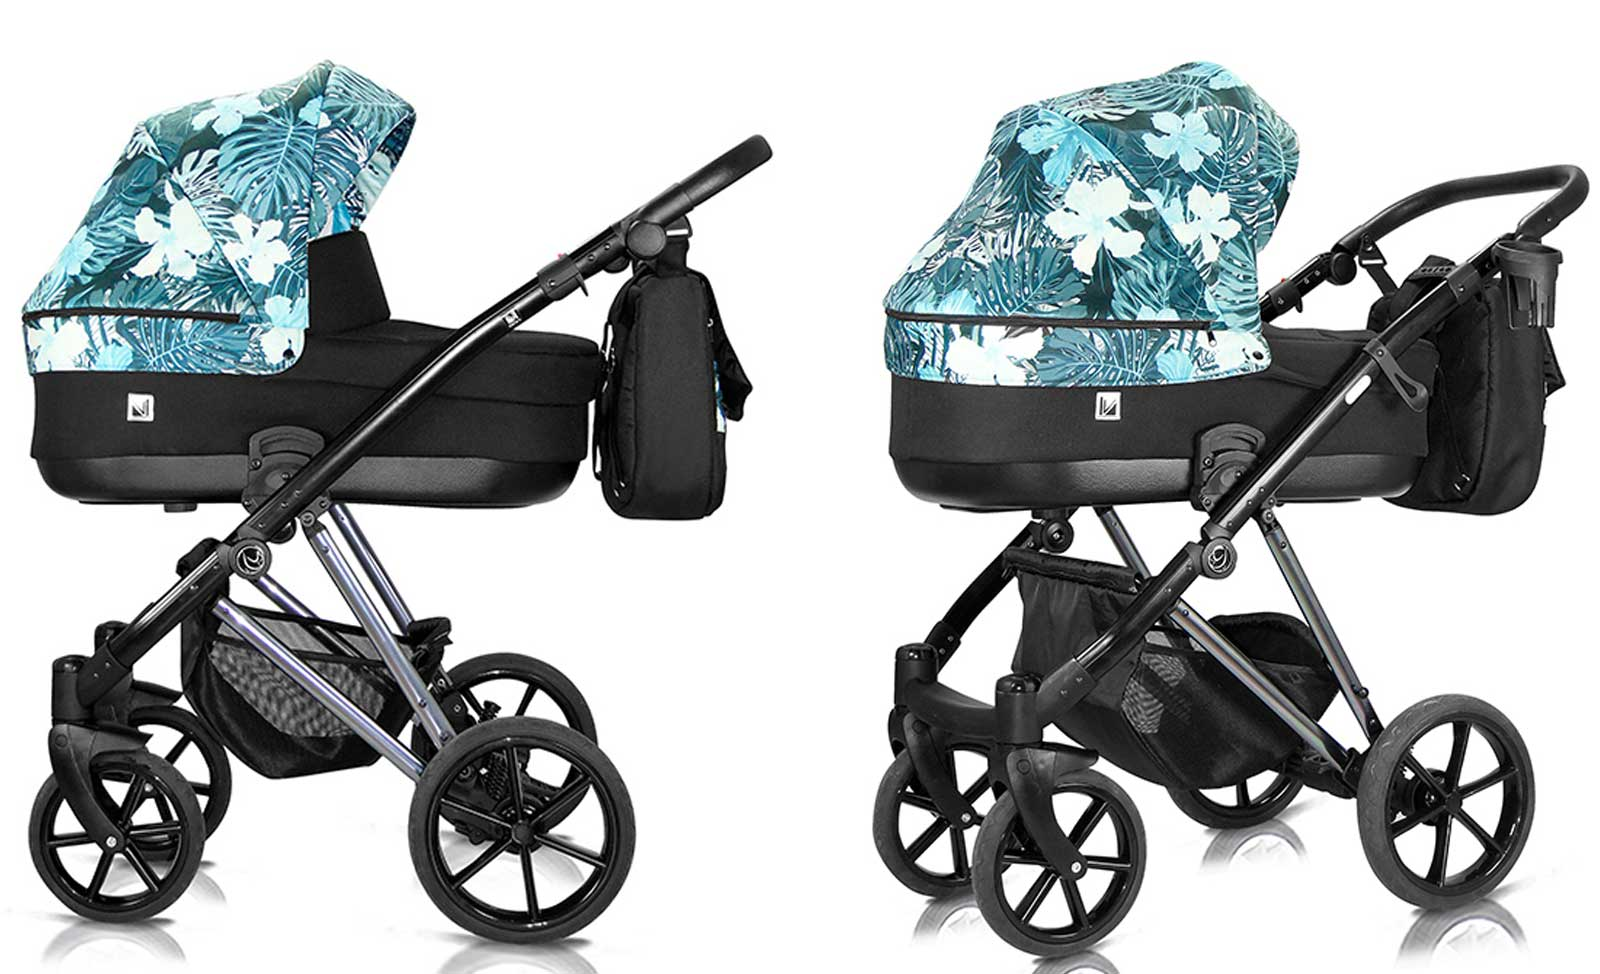 wózek dziecięcy Milu Kids Vivaio Less gondola